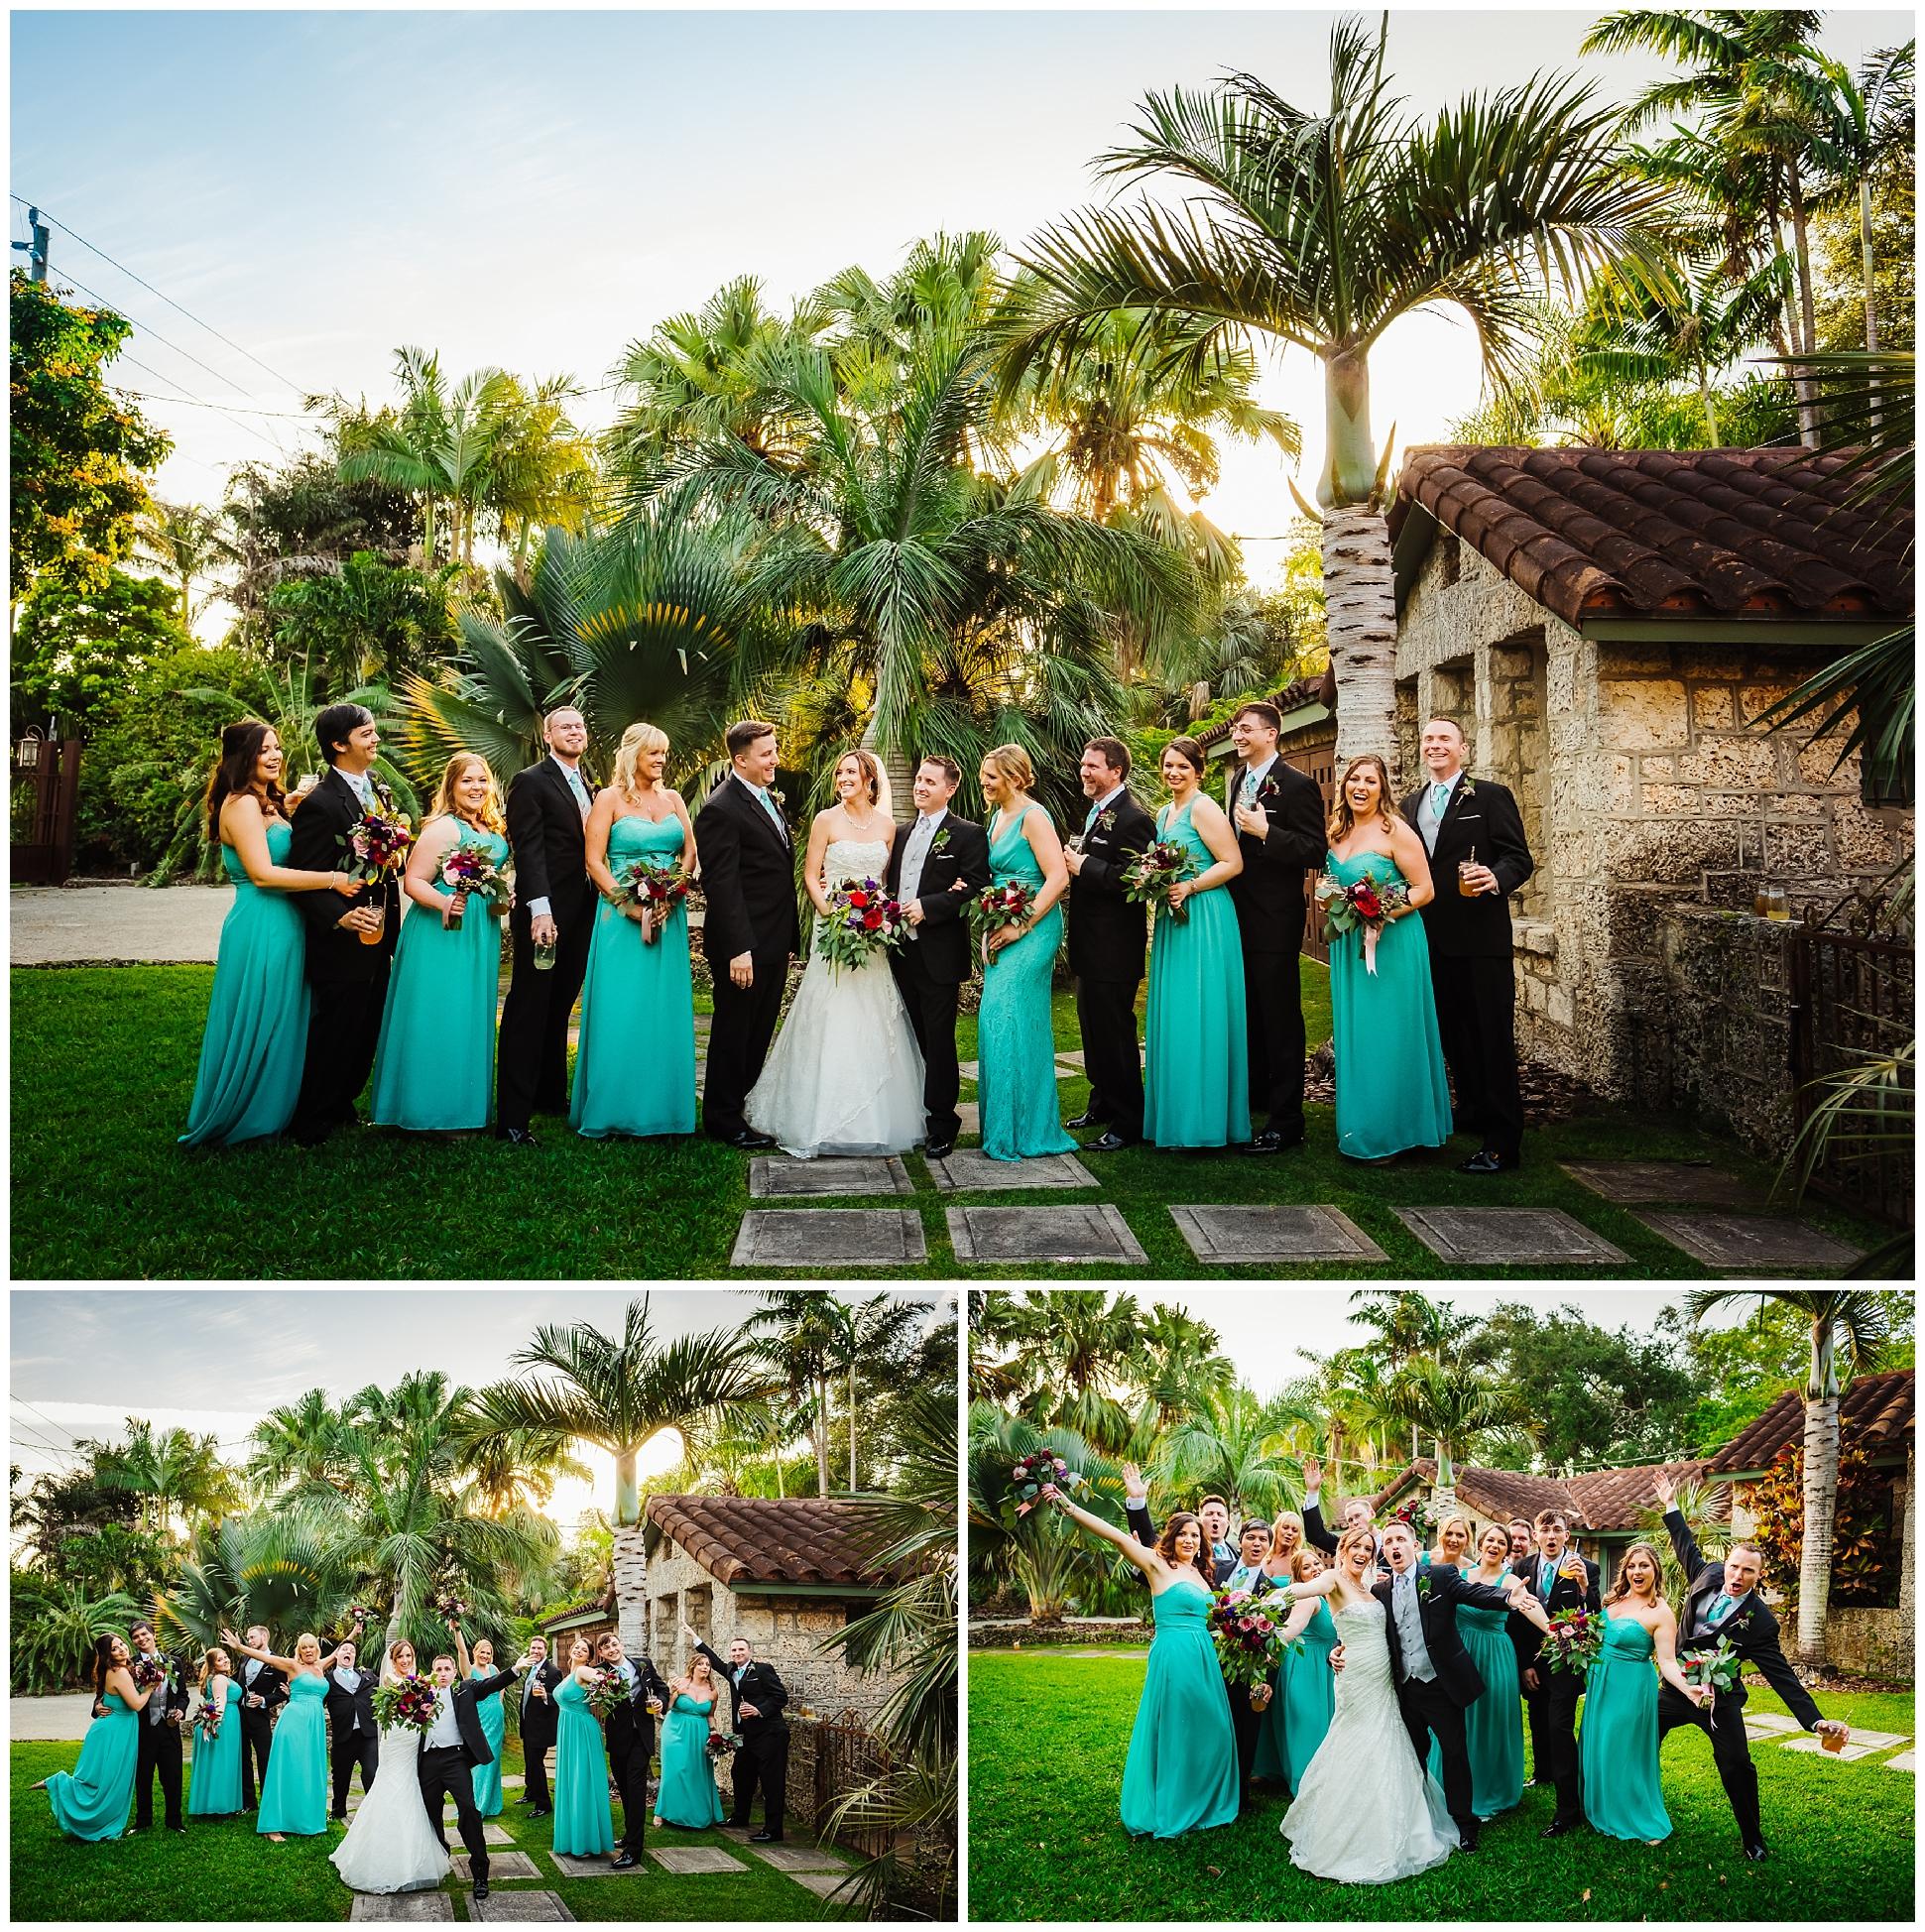 florida-destination-wedding-photographer-enchanted-tropical-miami-homestead-cooper-estate-teal_0059.jpg